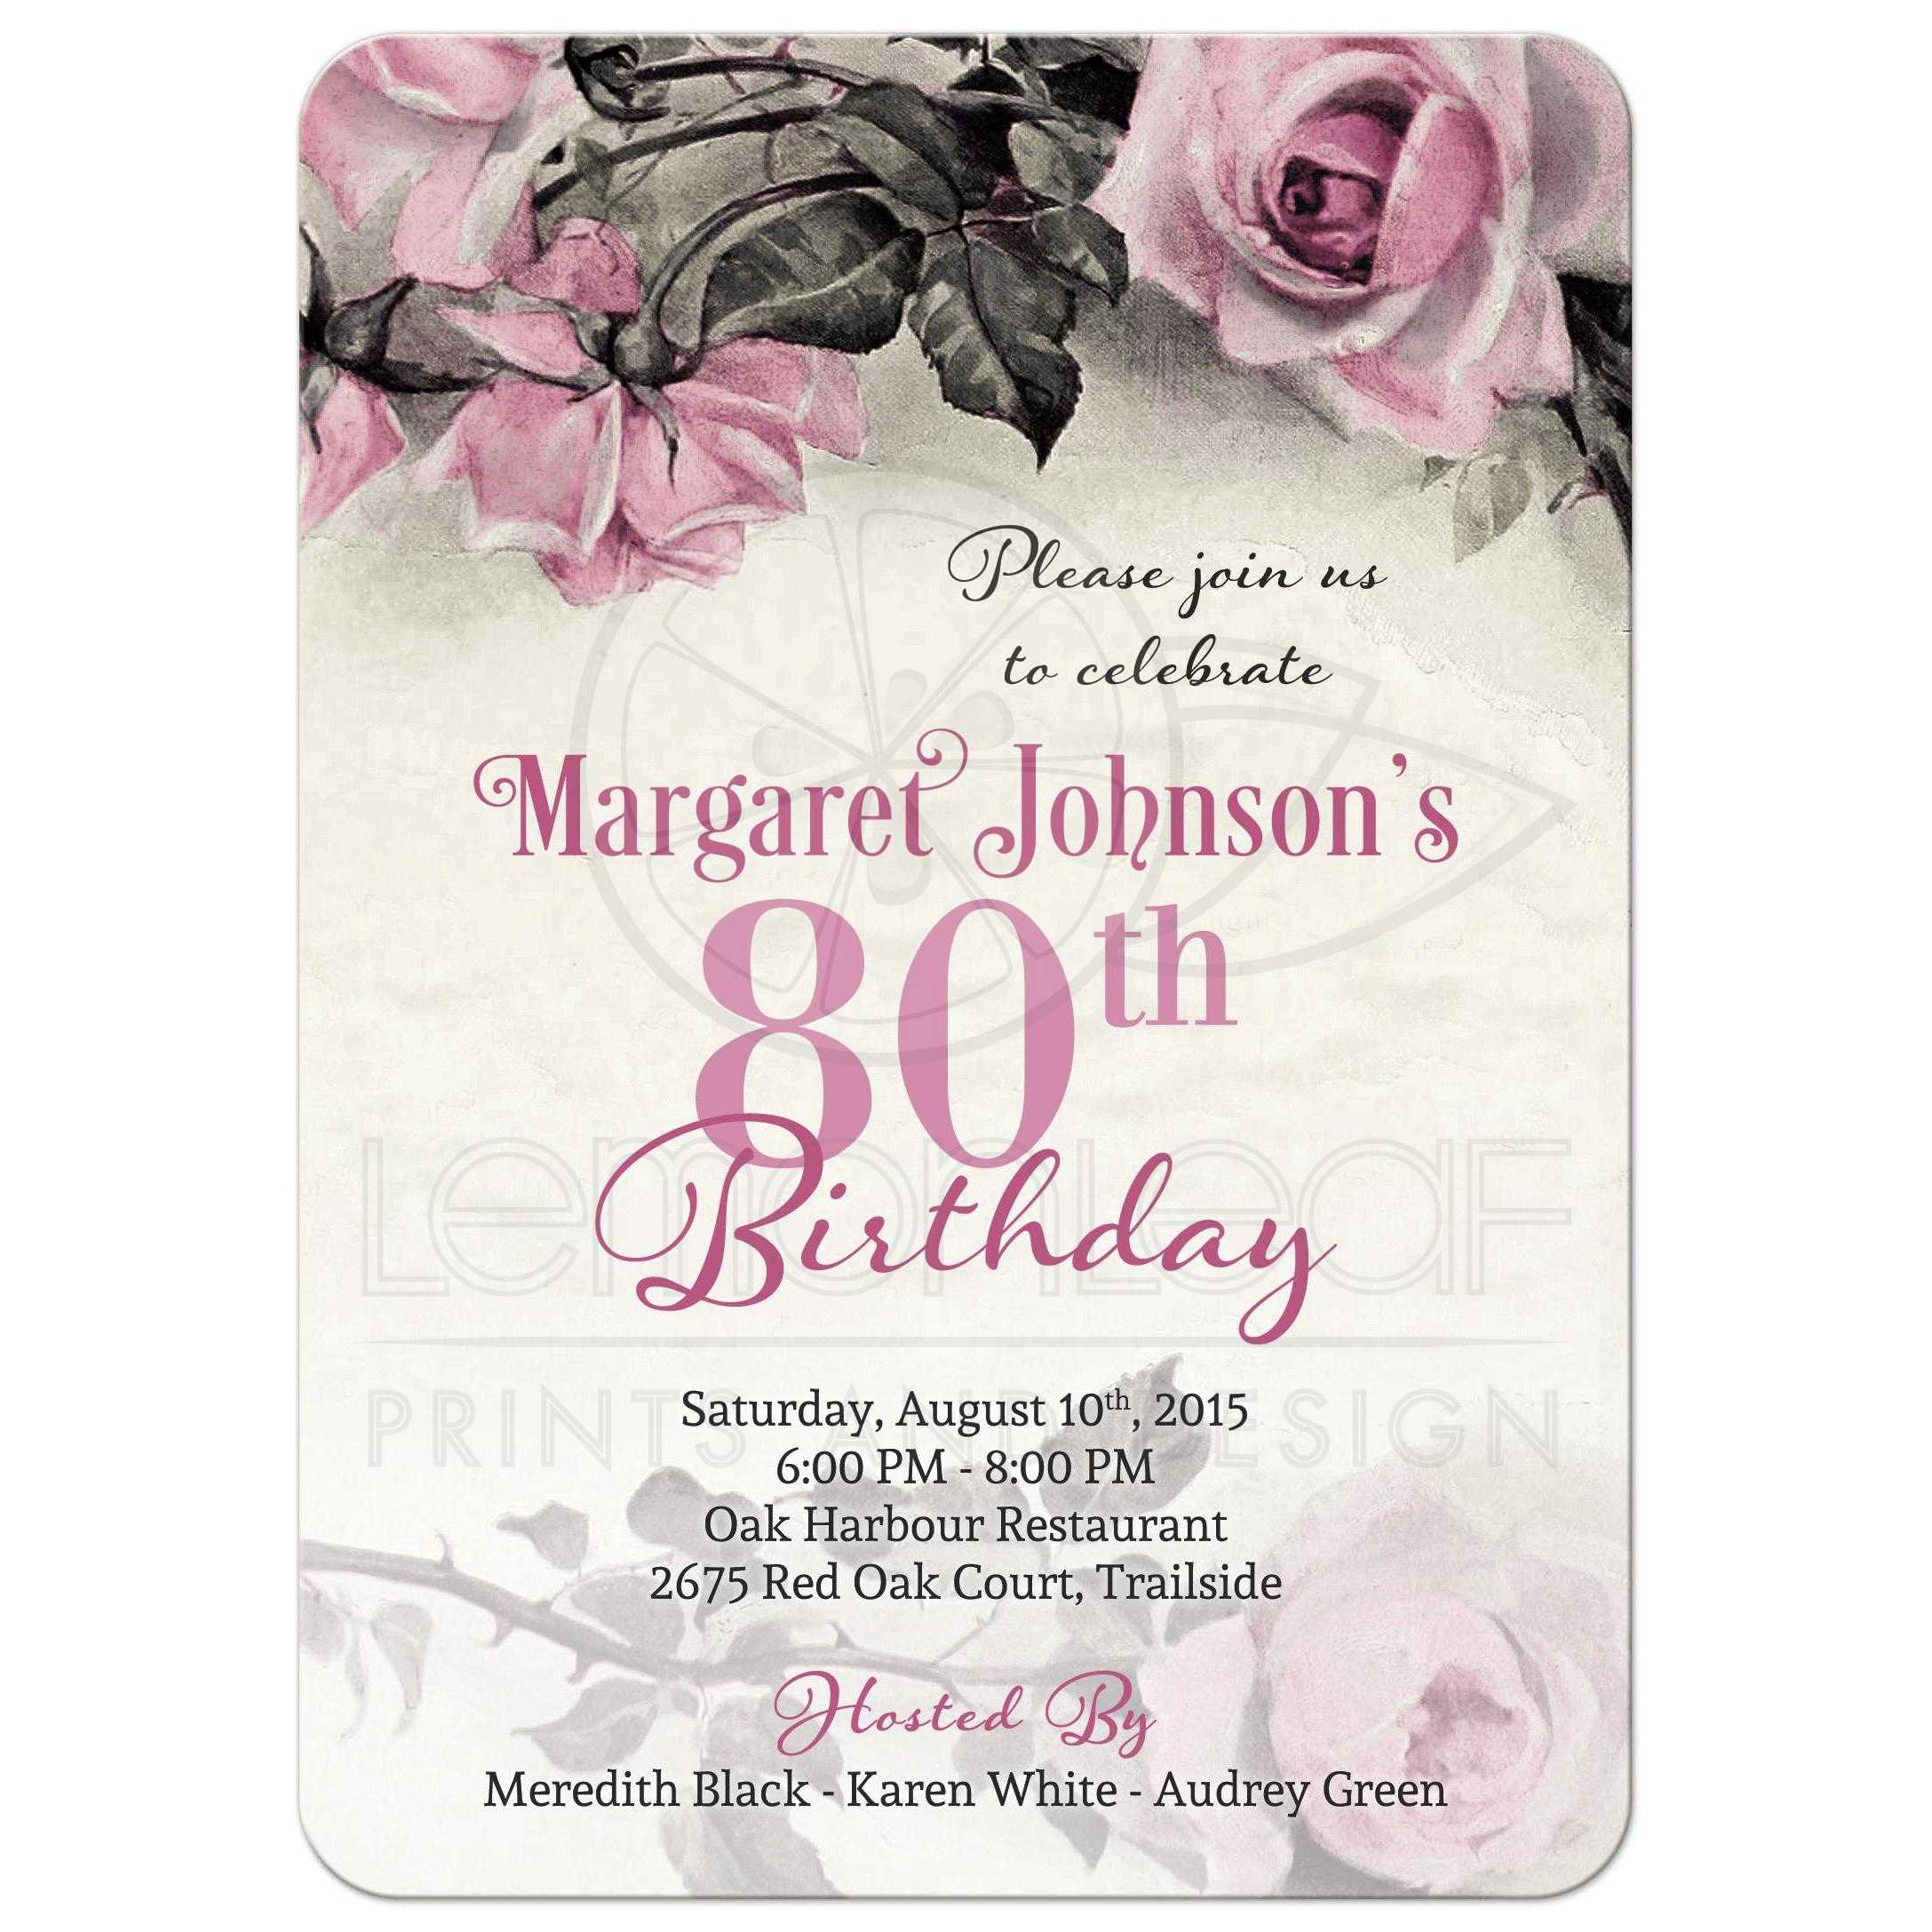 Supple Spanish 80th Birthday Invitations Grey S Ivory Rose Birthday Party Invitation Front Birthday Invitation Vintage Pink Grey Rose 80th Birthday Invitations invitations 80th Birthday Invitations